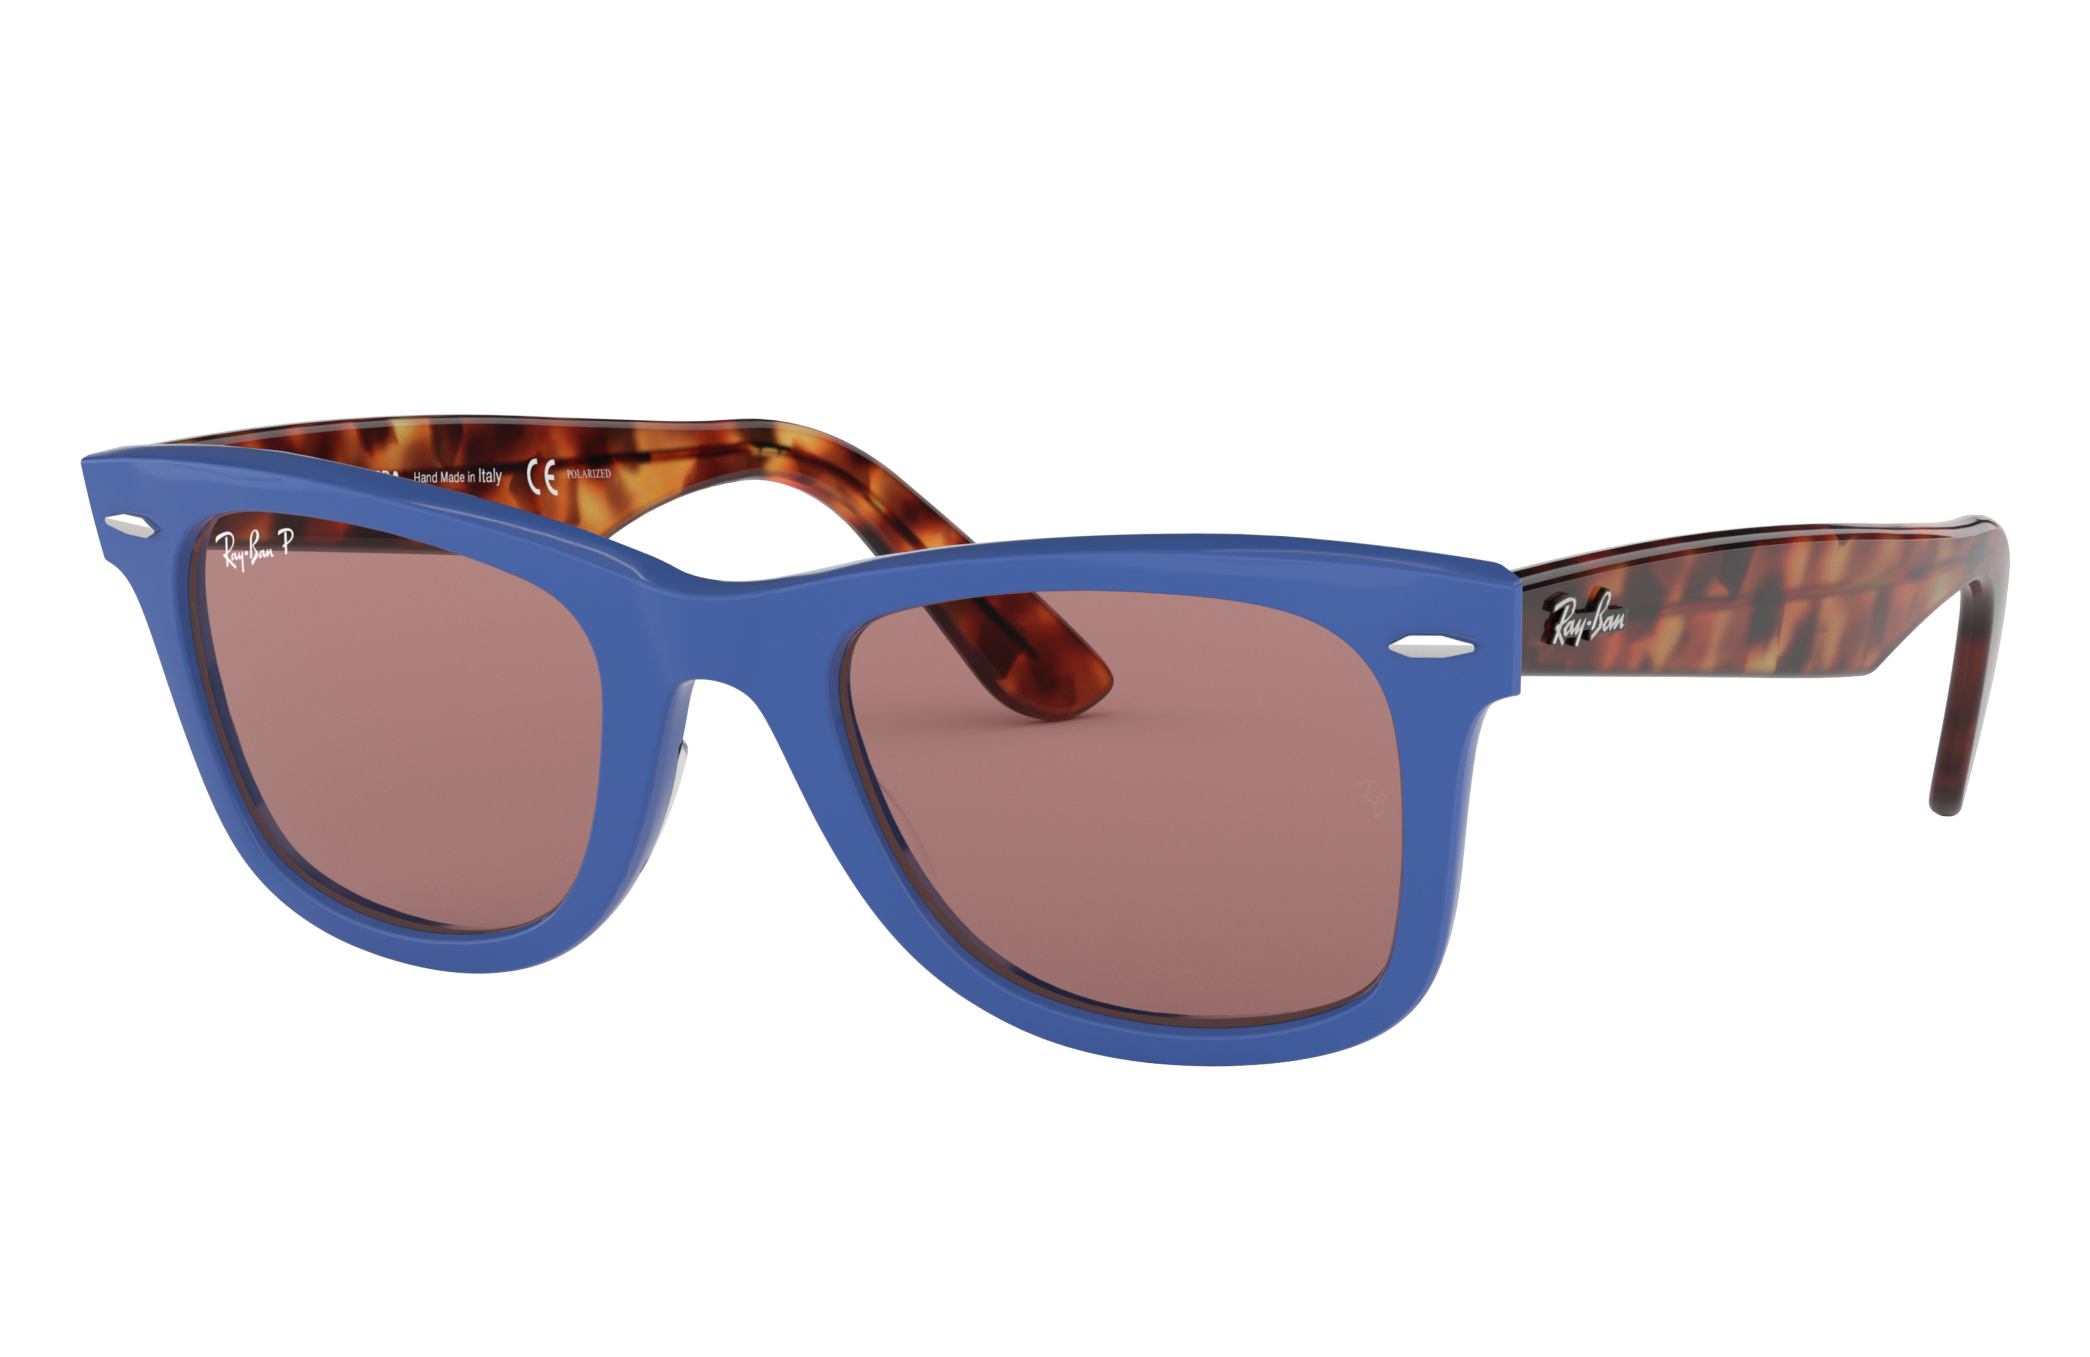 Ray-Ban Wayfarer Pop Tortoise, Polarized Violet Lenses - RB2140